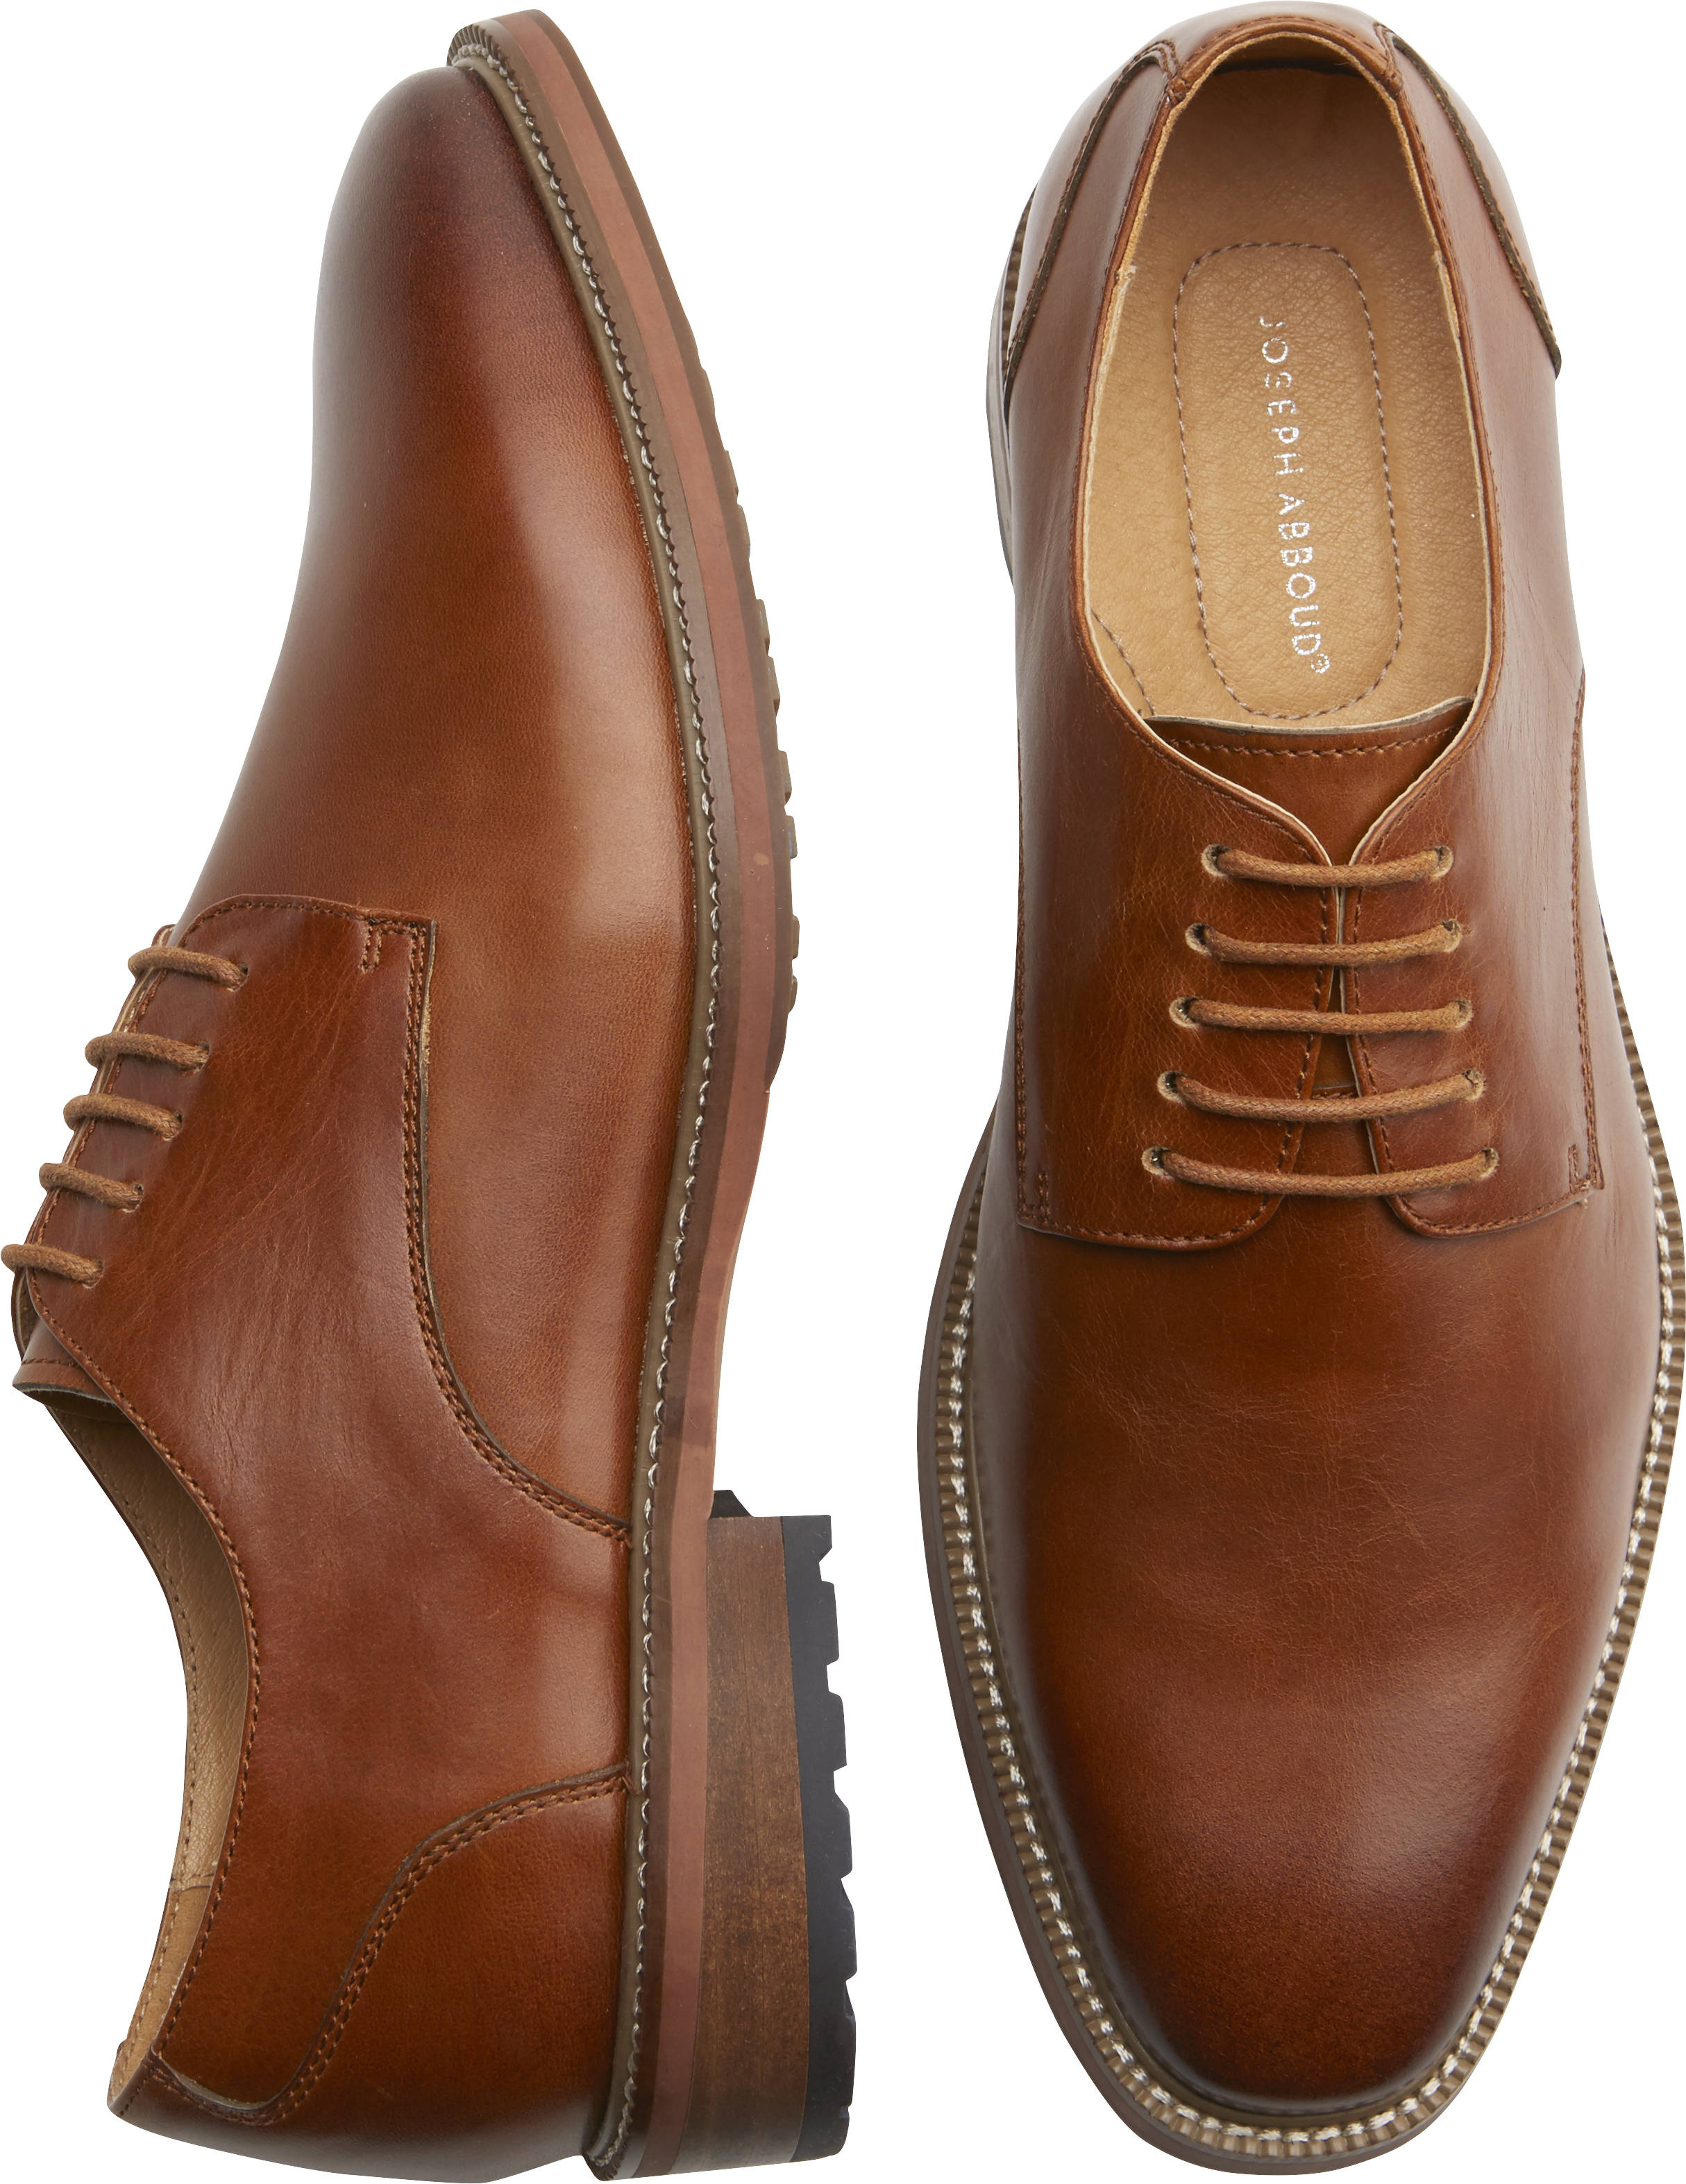 Mens Brown Wedding Shoes Threading Box MJ015621